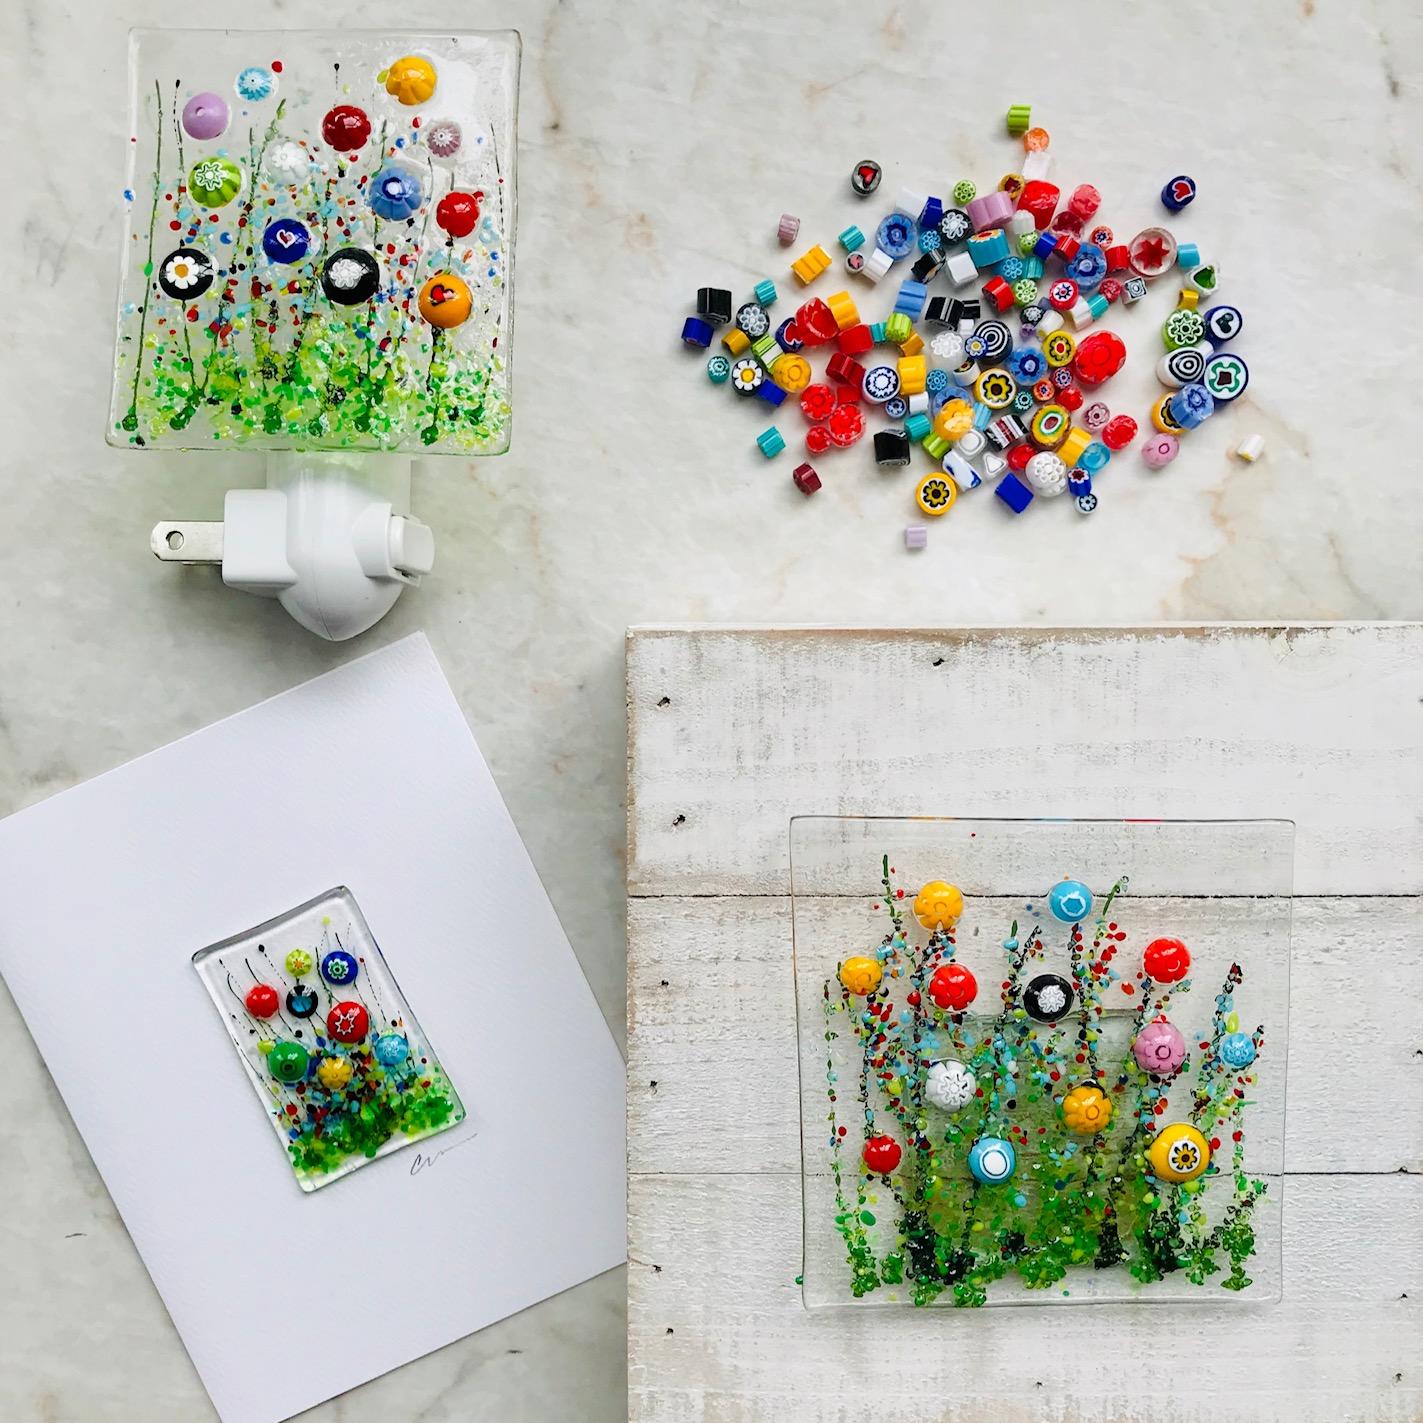 charity-stewart-glass-designs.jpg